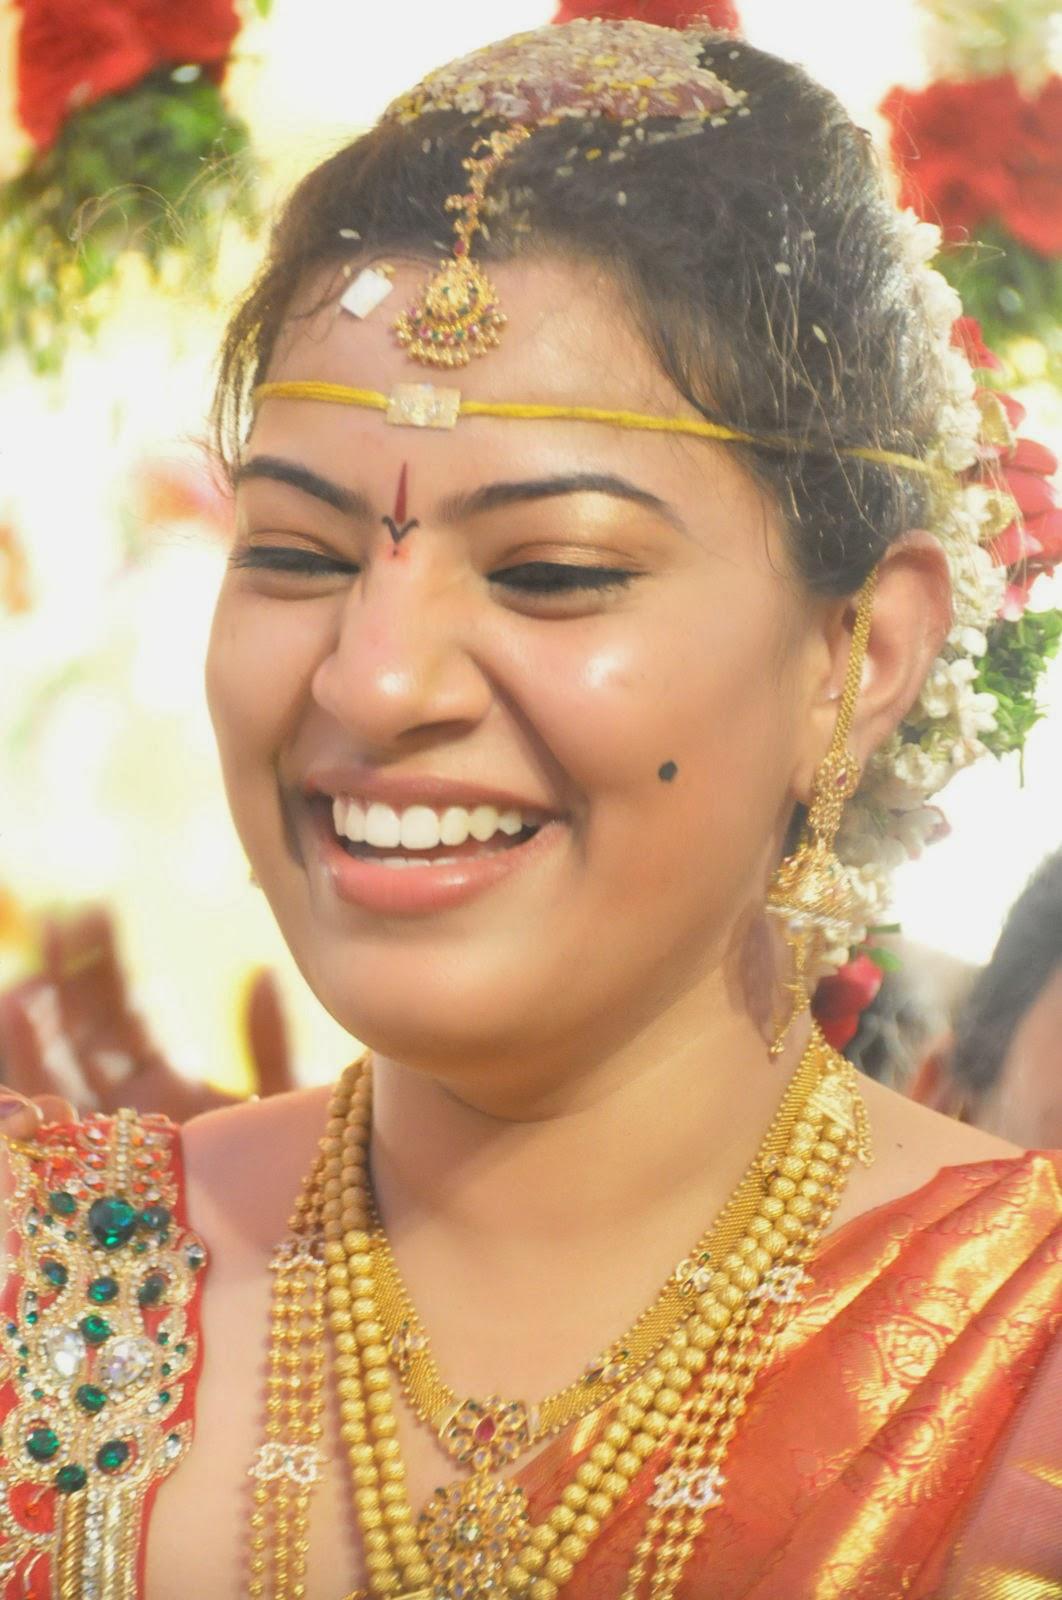 geetha madhuri in pelliukuthuru look photos latest movie